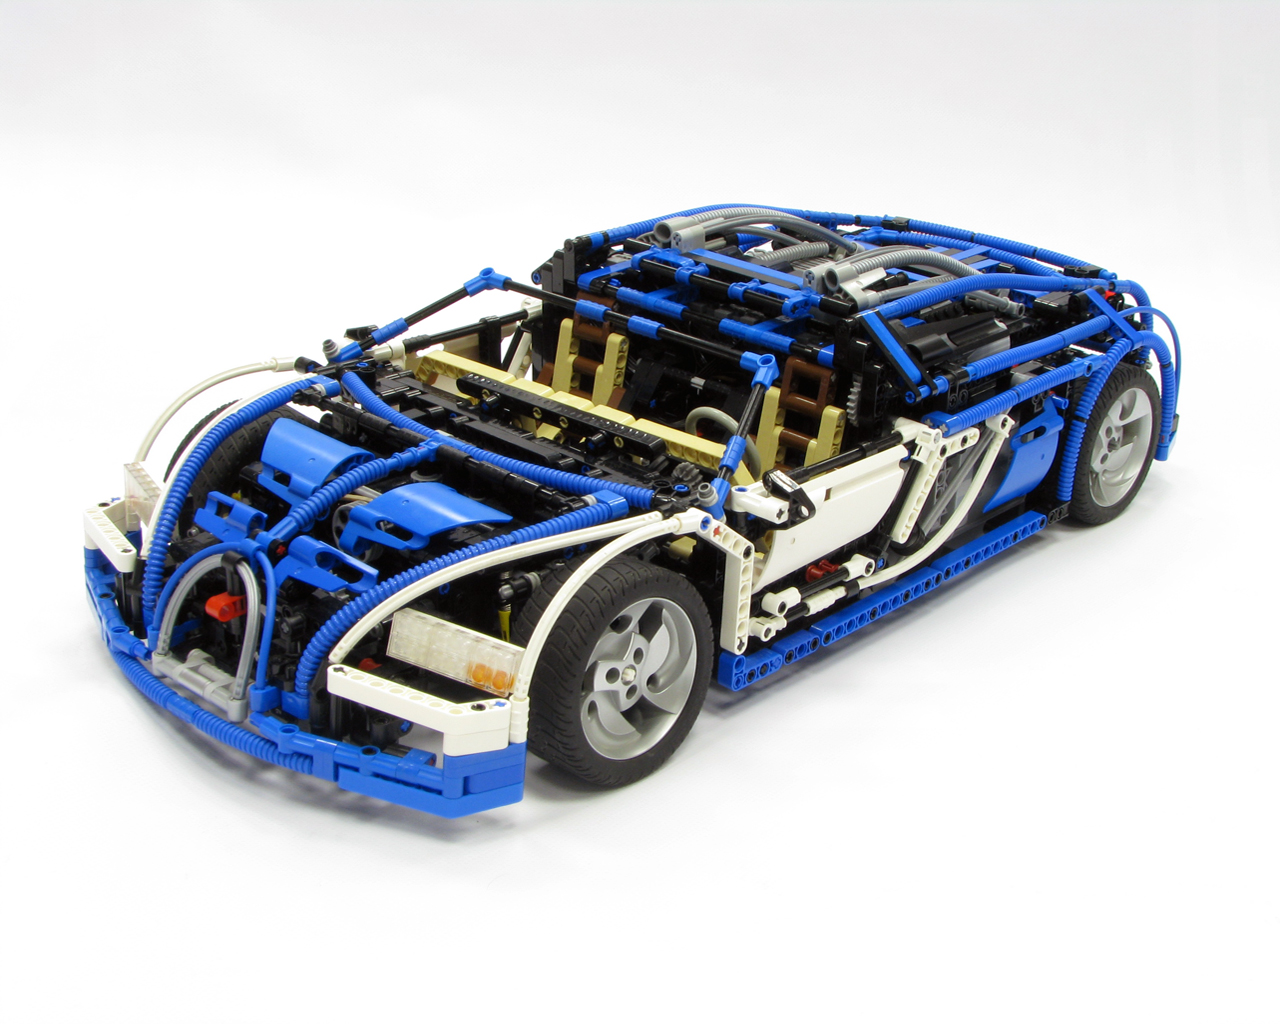 brickshelf gallery bugatti veyron. Black Bedroom Furniture Sets. Home Design Ideas